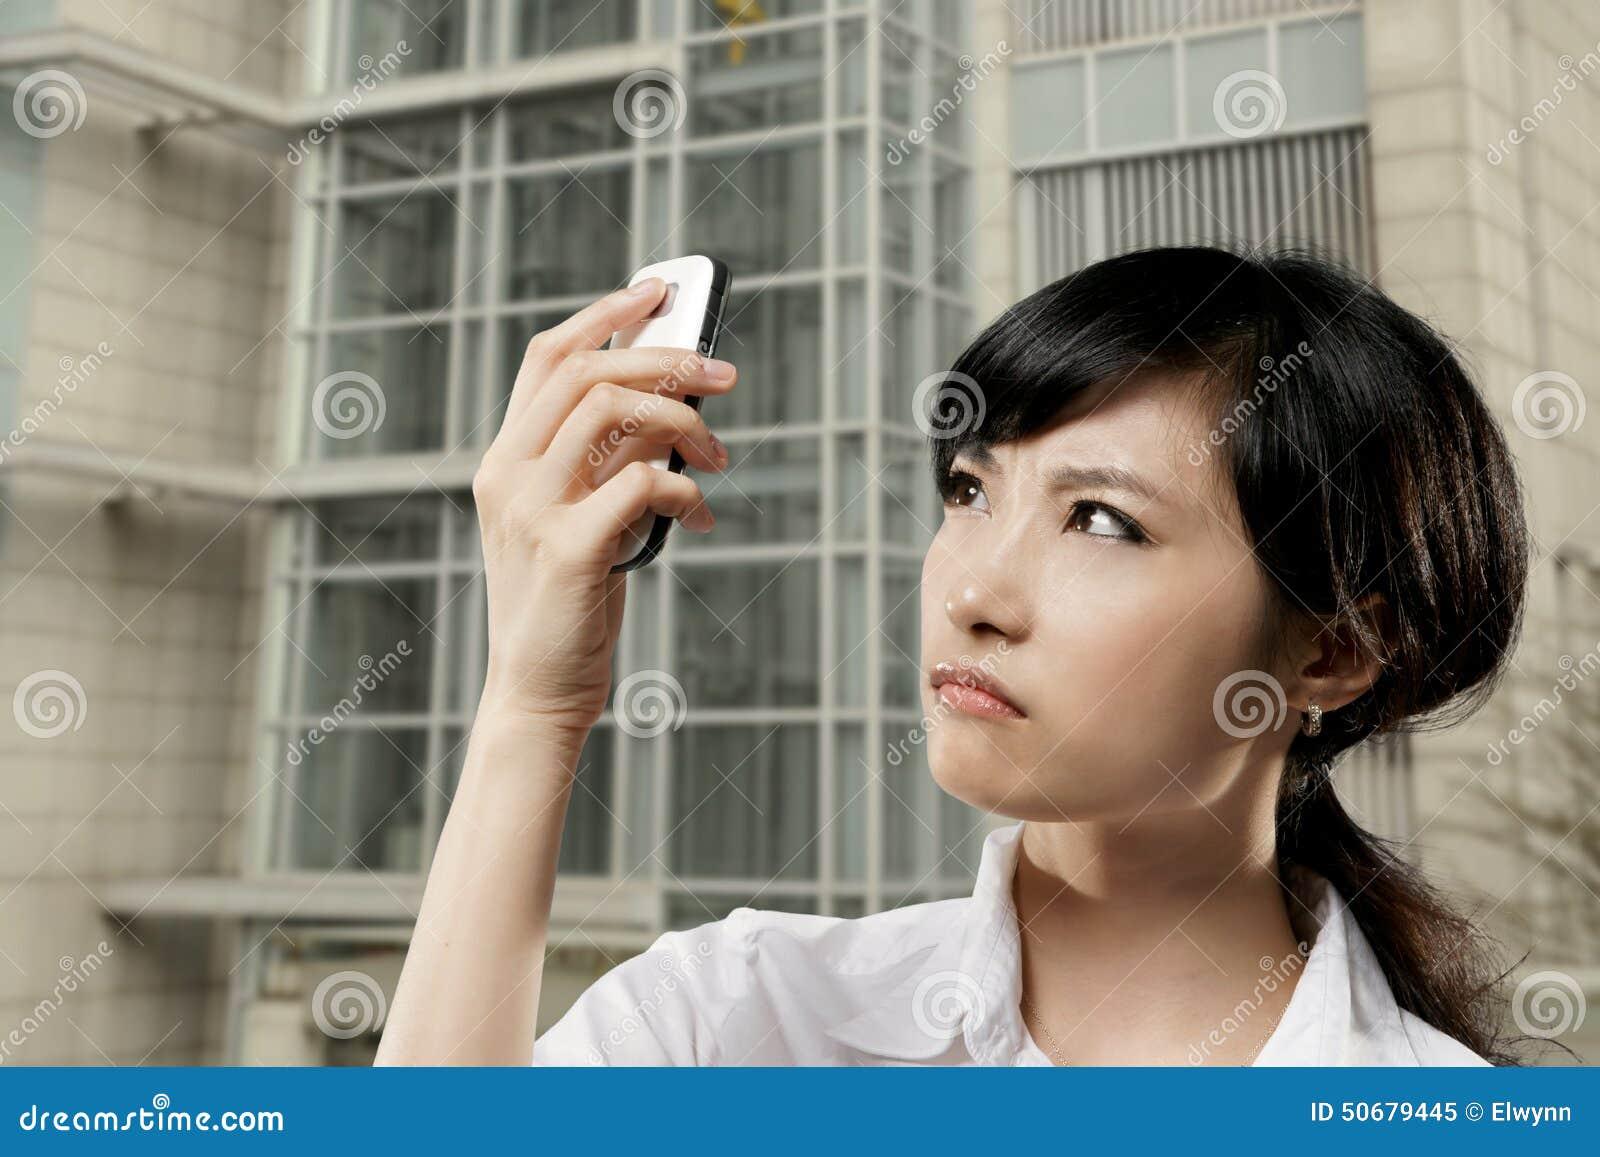 Download 恼怒的女商人 库存图片. 图片 包括有 商业, 字符, 查找, 女实业家, 表面, 忧虑, 藏品, 人力 - 50679445